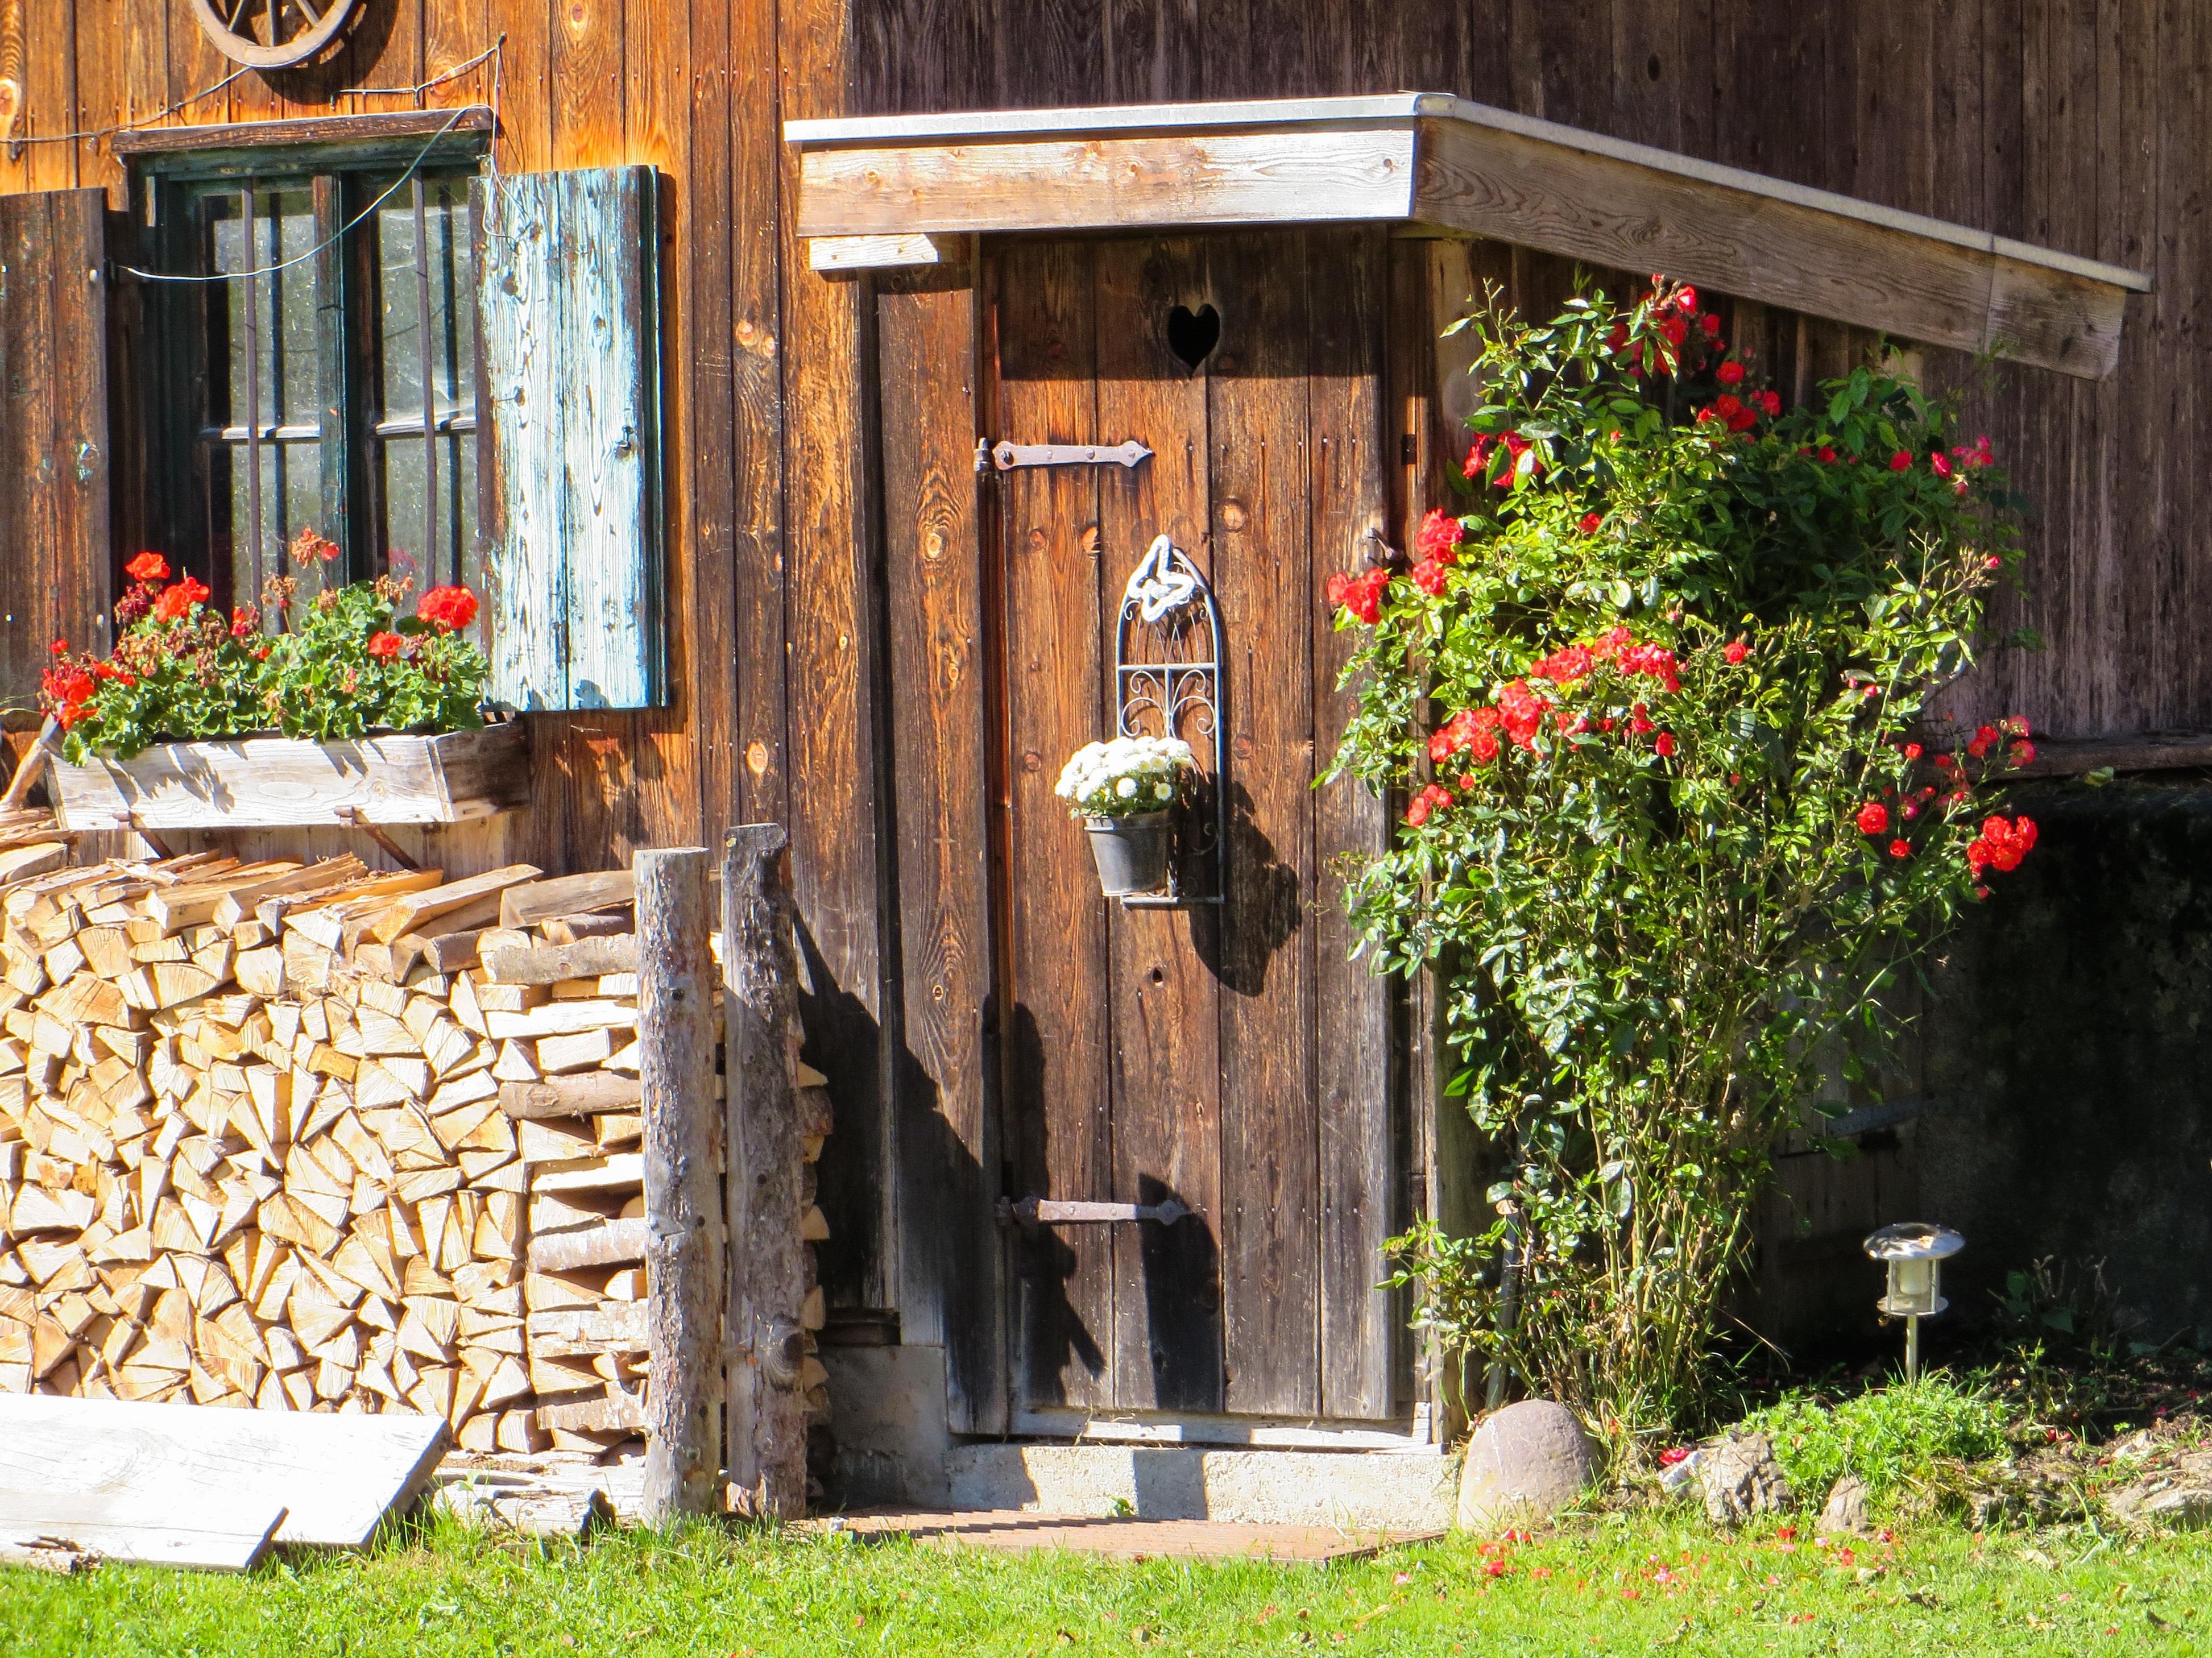 fotos gratis madera casa flor cobertizo coraz n caba a patio interior ba o jard n. Black Bedroom Furniture Sets. Home Design Ideas